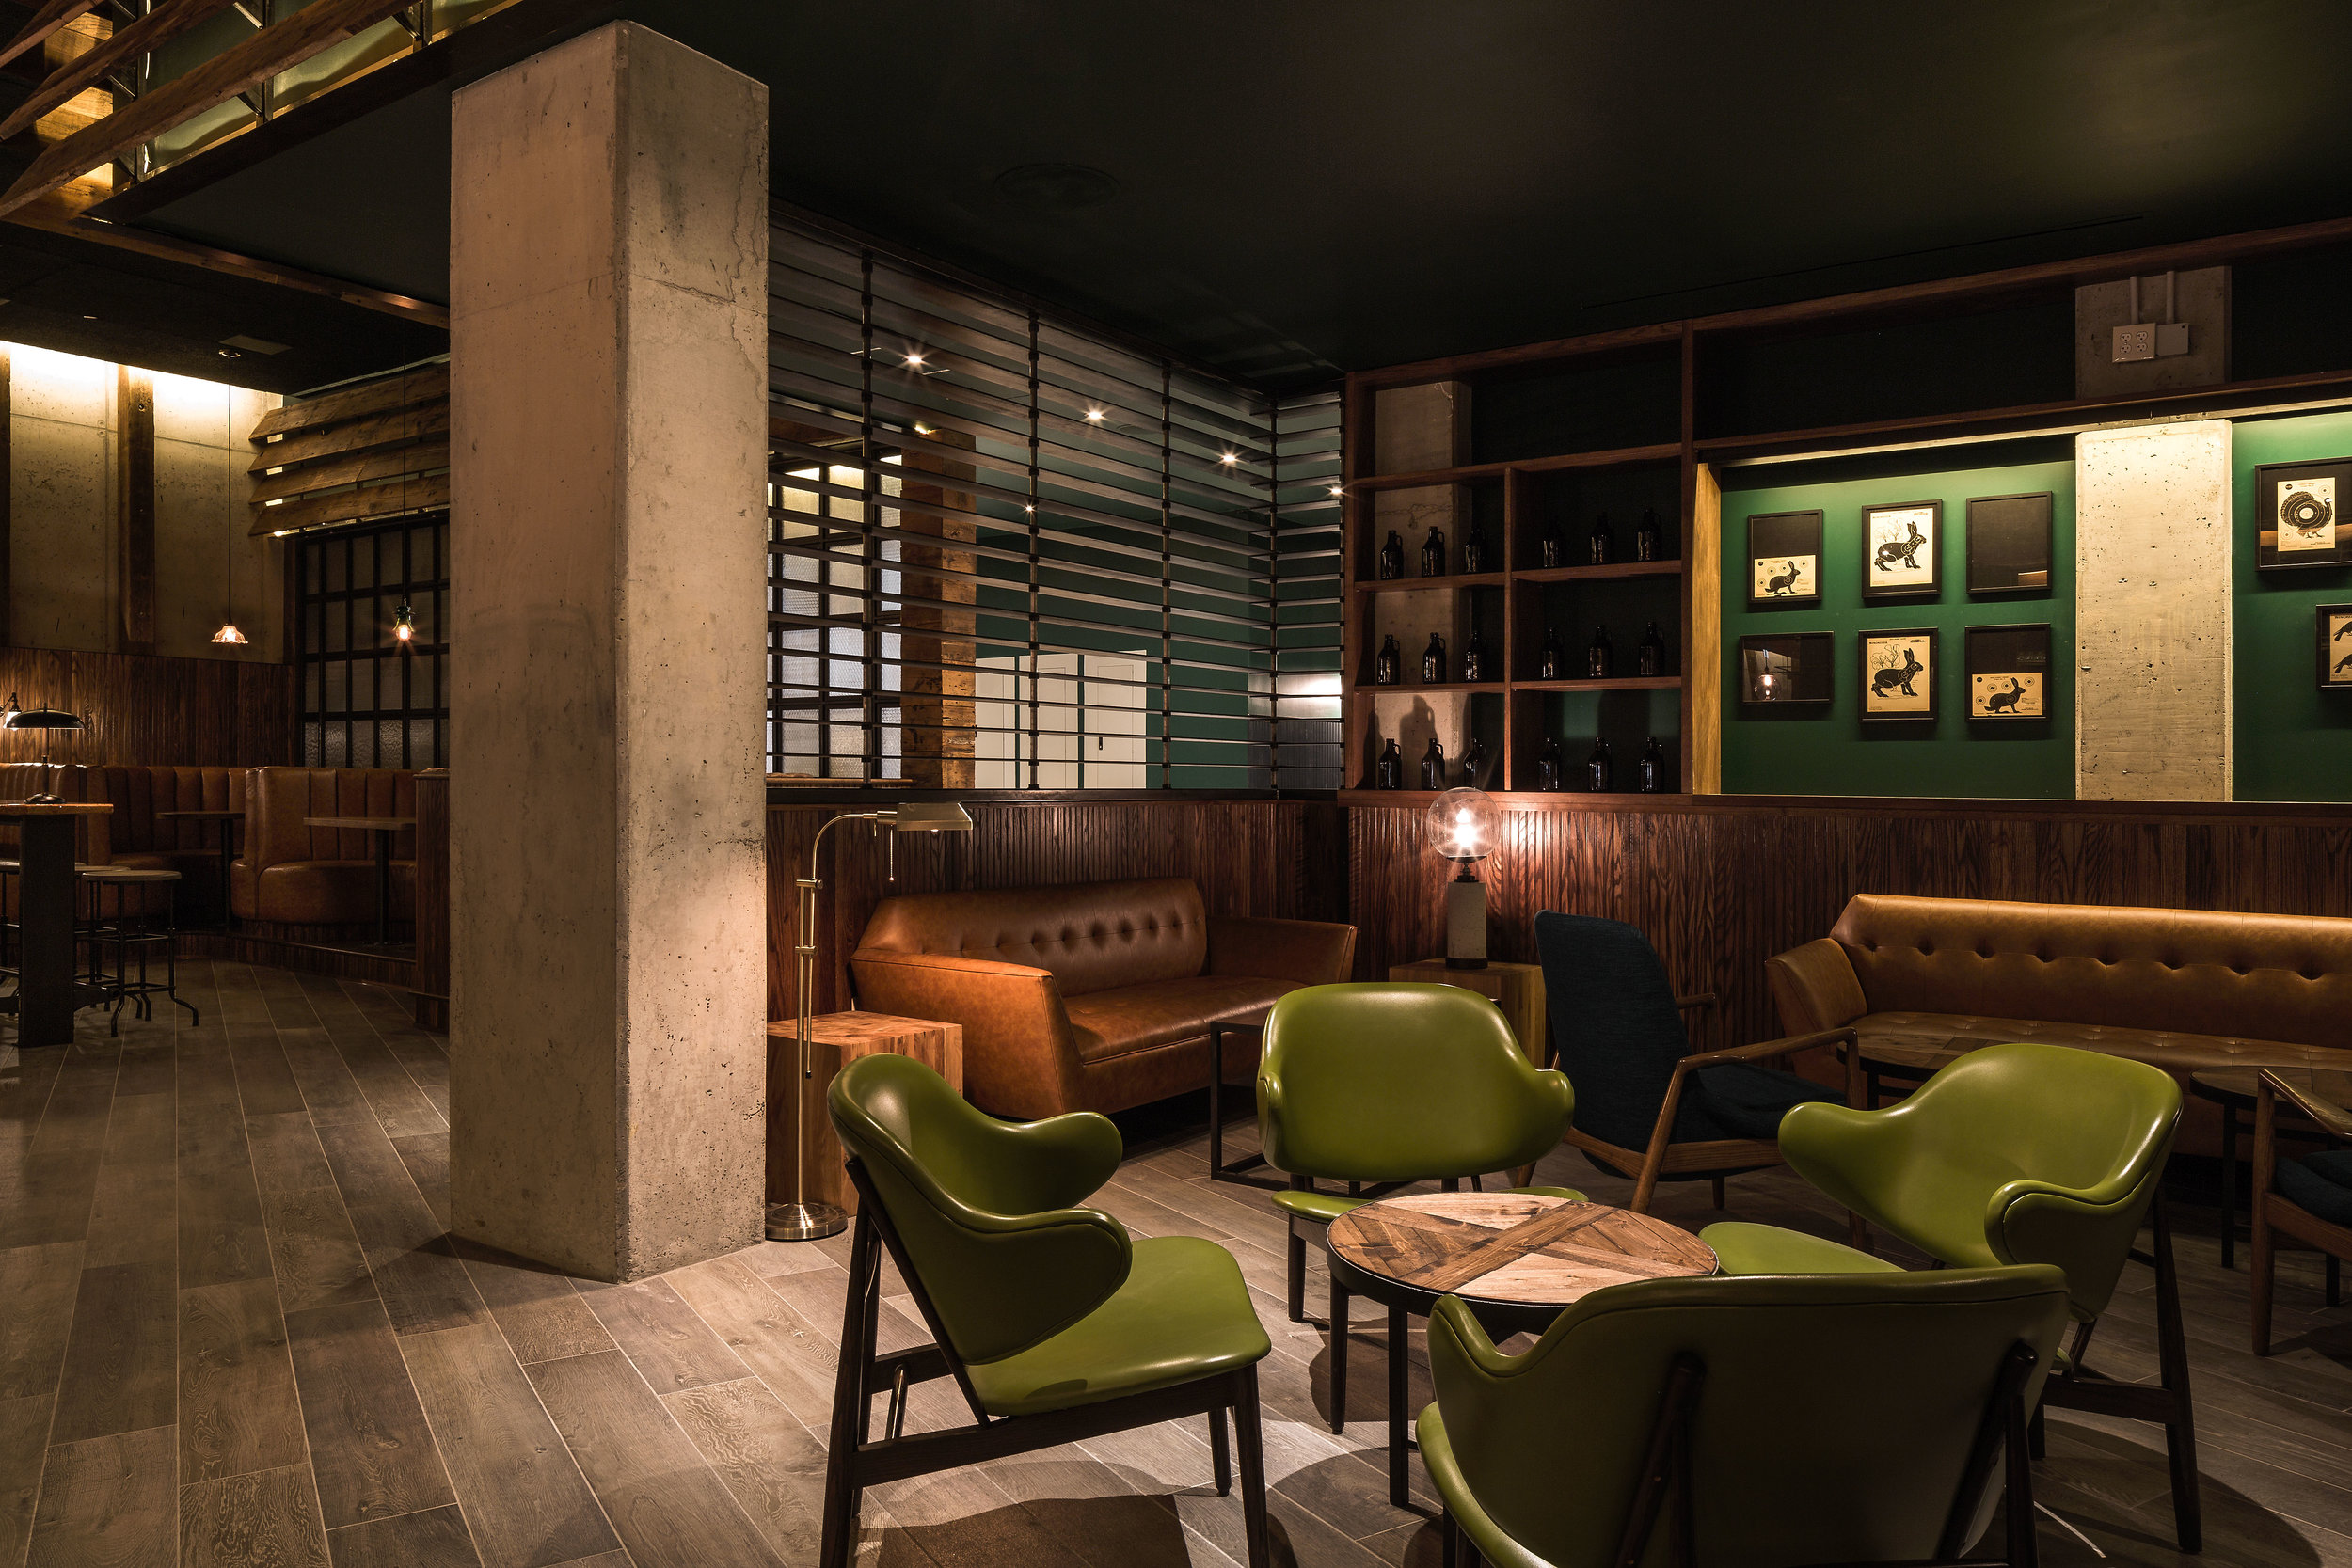 studio-saint-hotels-pod-hotel-crimson-whiskey-washington-dc-7